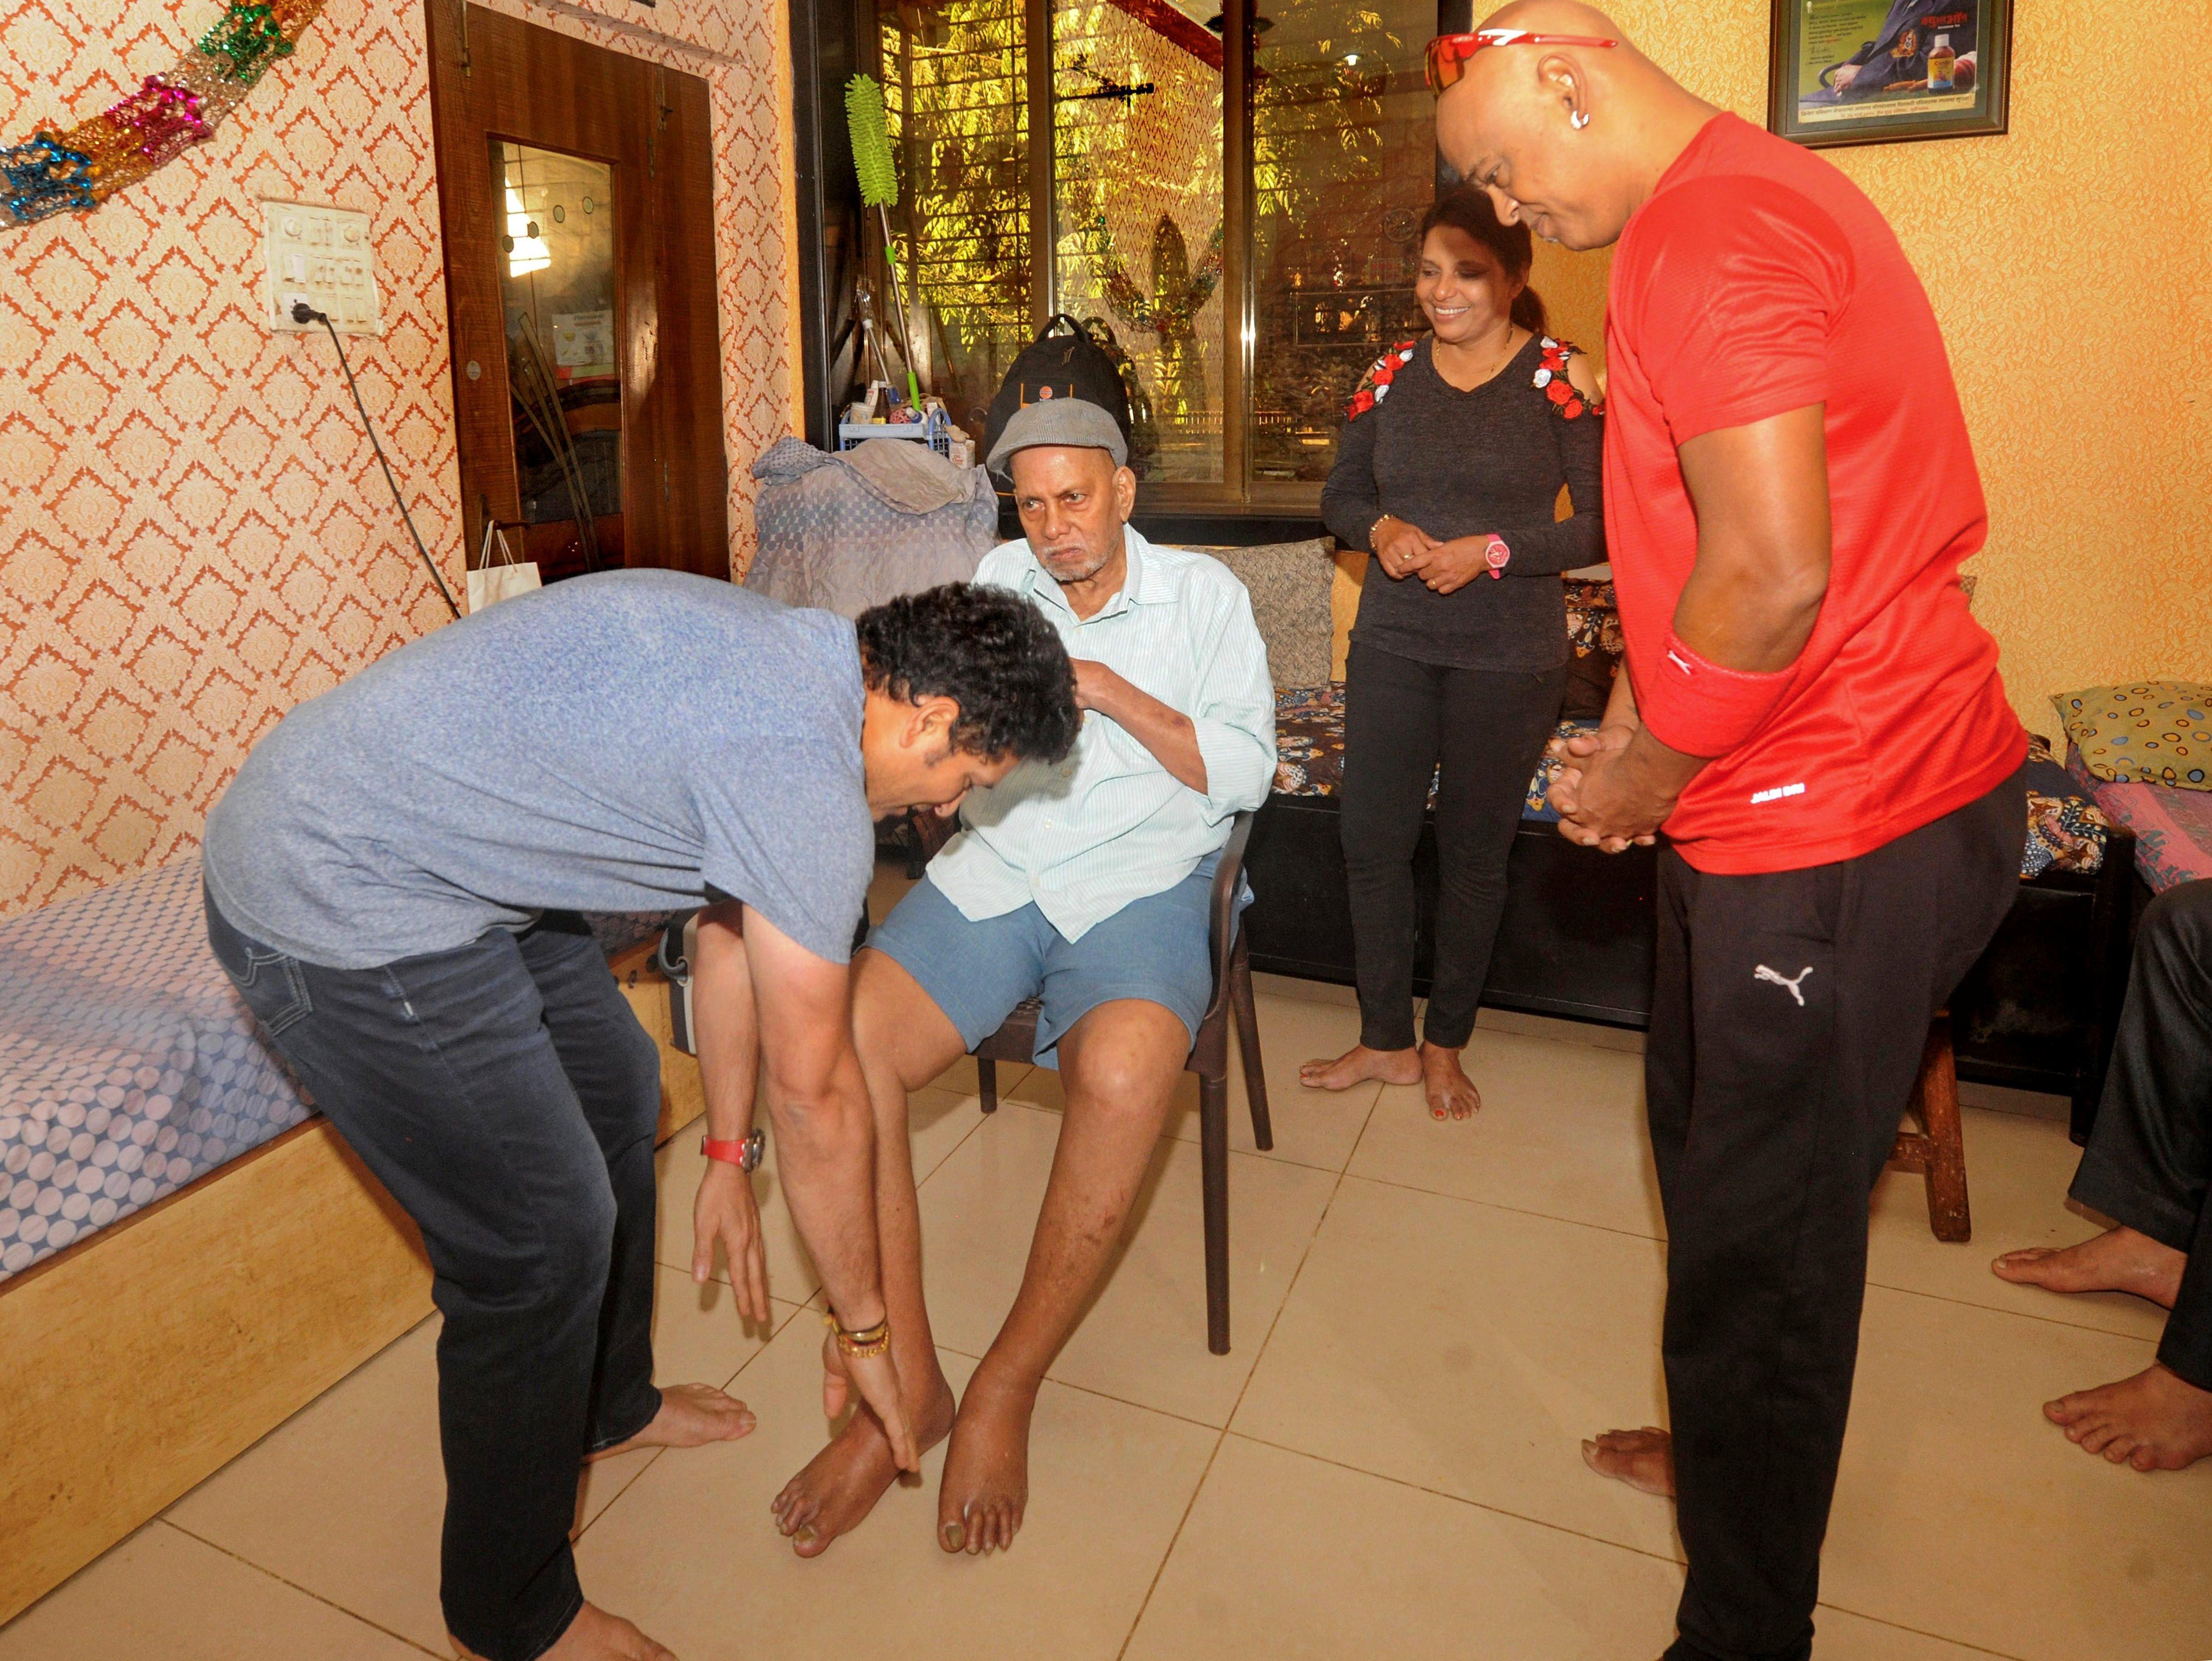 Tendulkar and Kambli seeking blessings from their childhood coach Ramakant Achrekar | Twitter